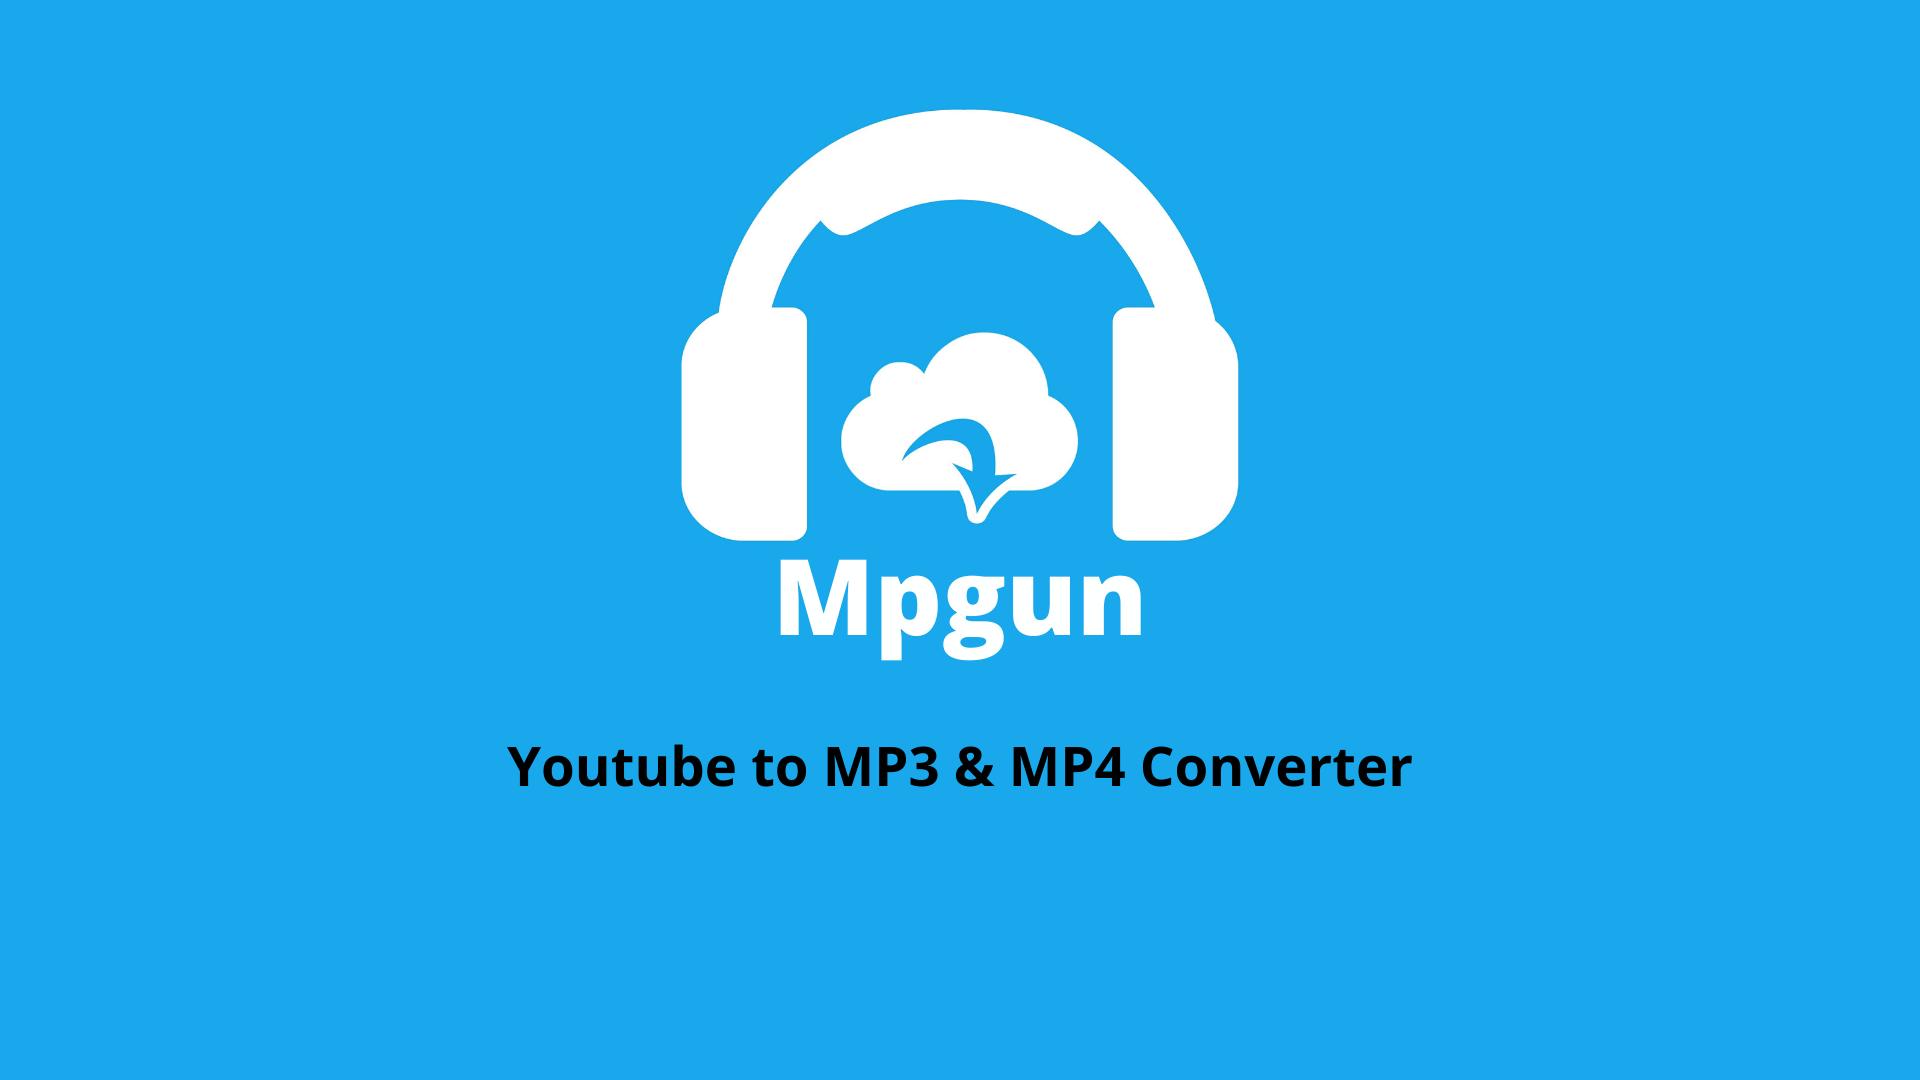 What is Mpgun?